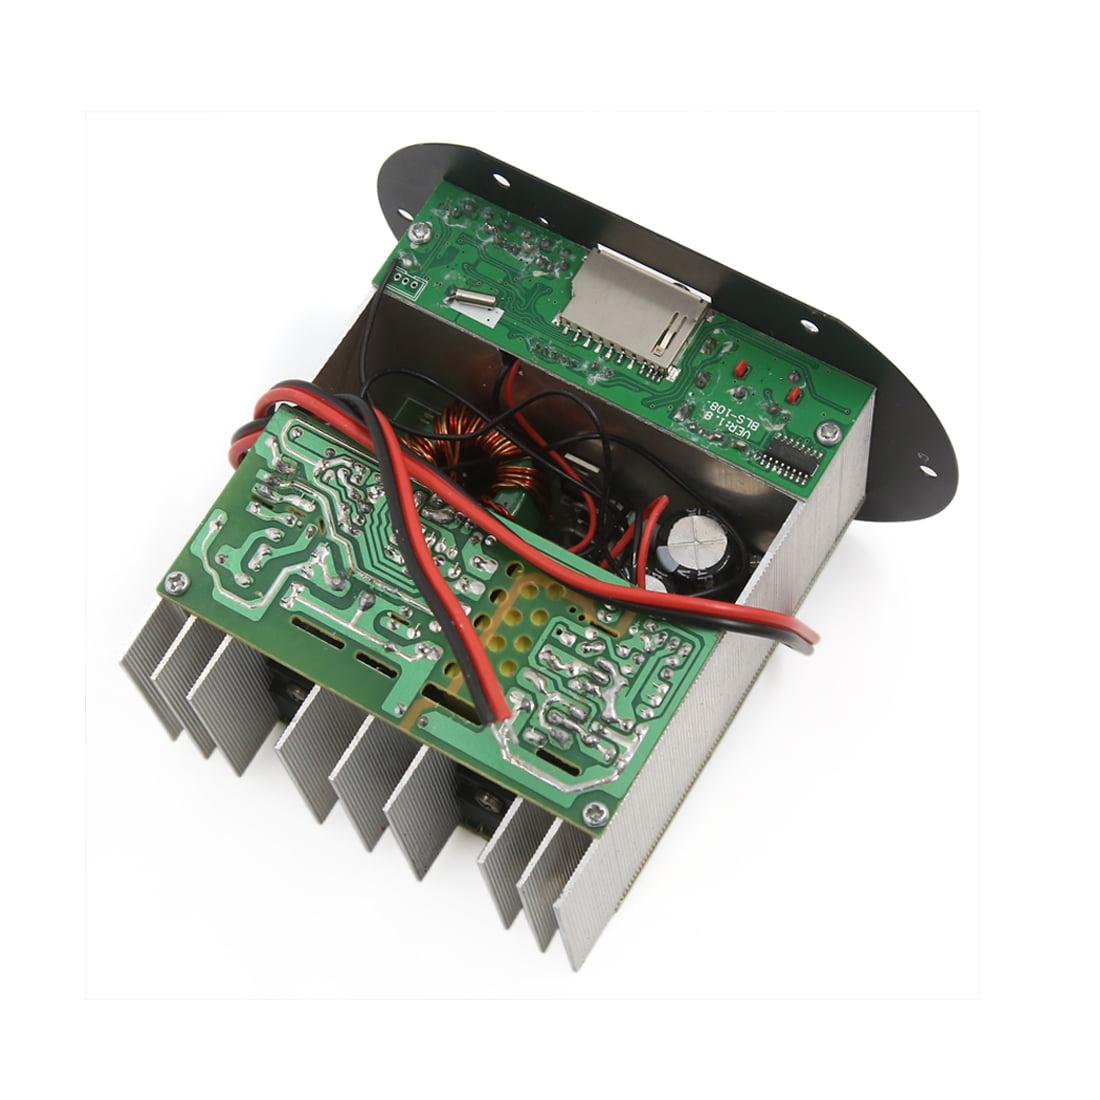 DC 12V Metal Audio Stereo Power Amplifier Board Module for Car Automobile - image 1 de 4